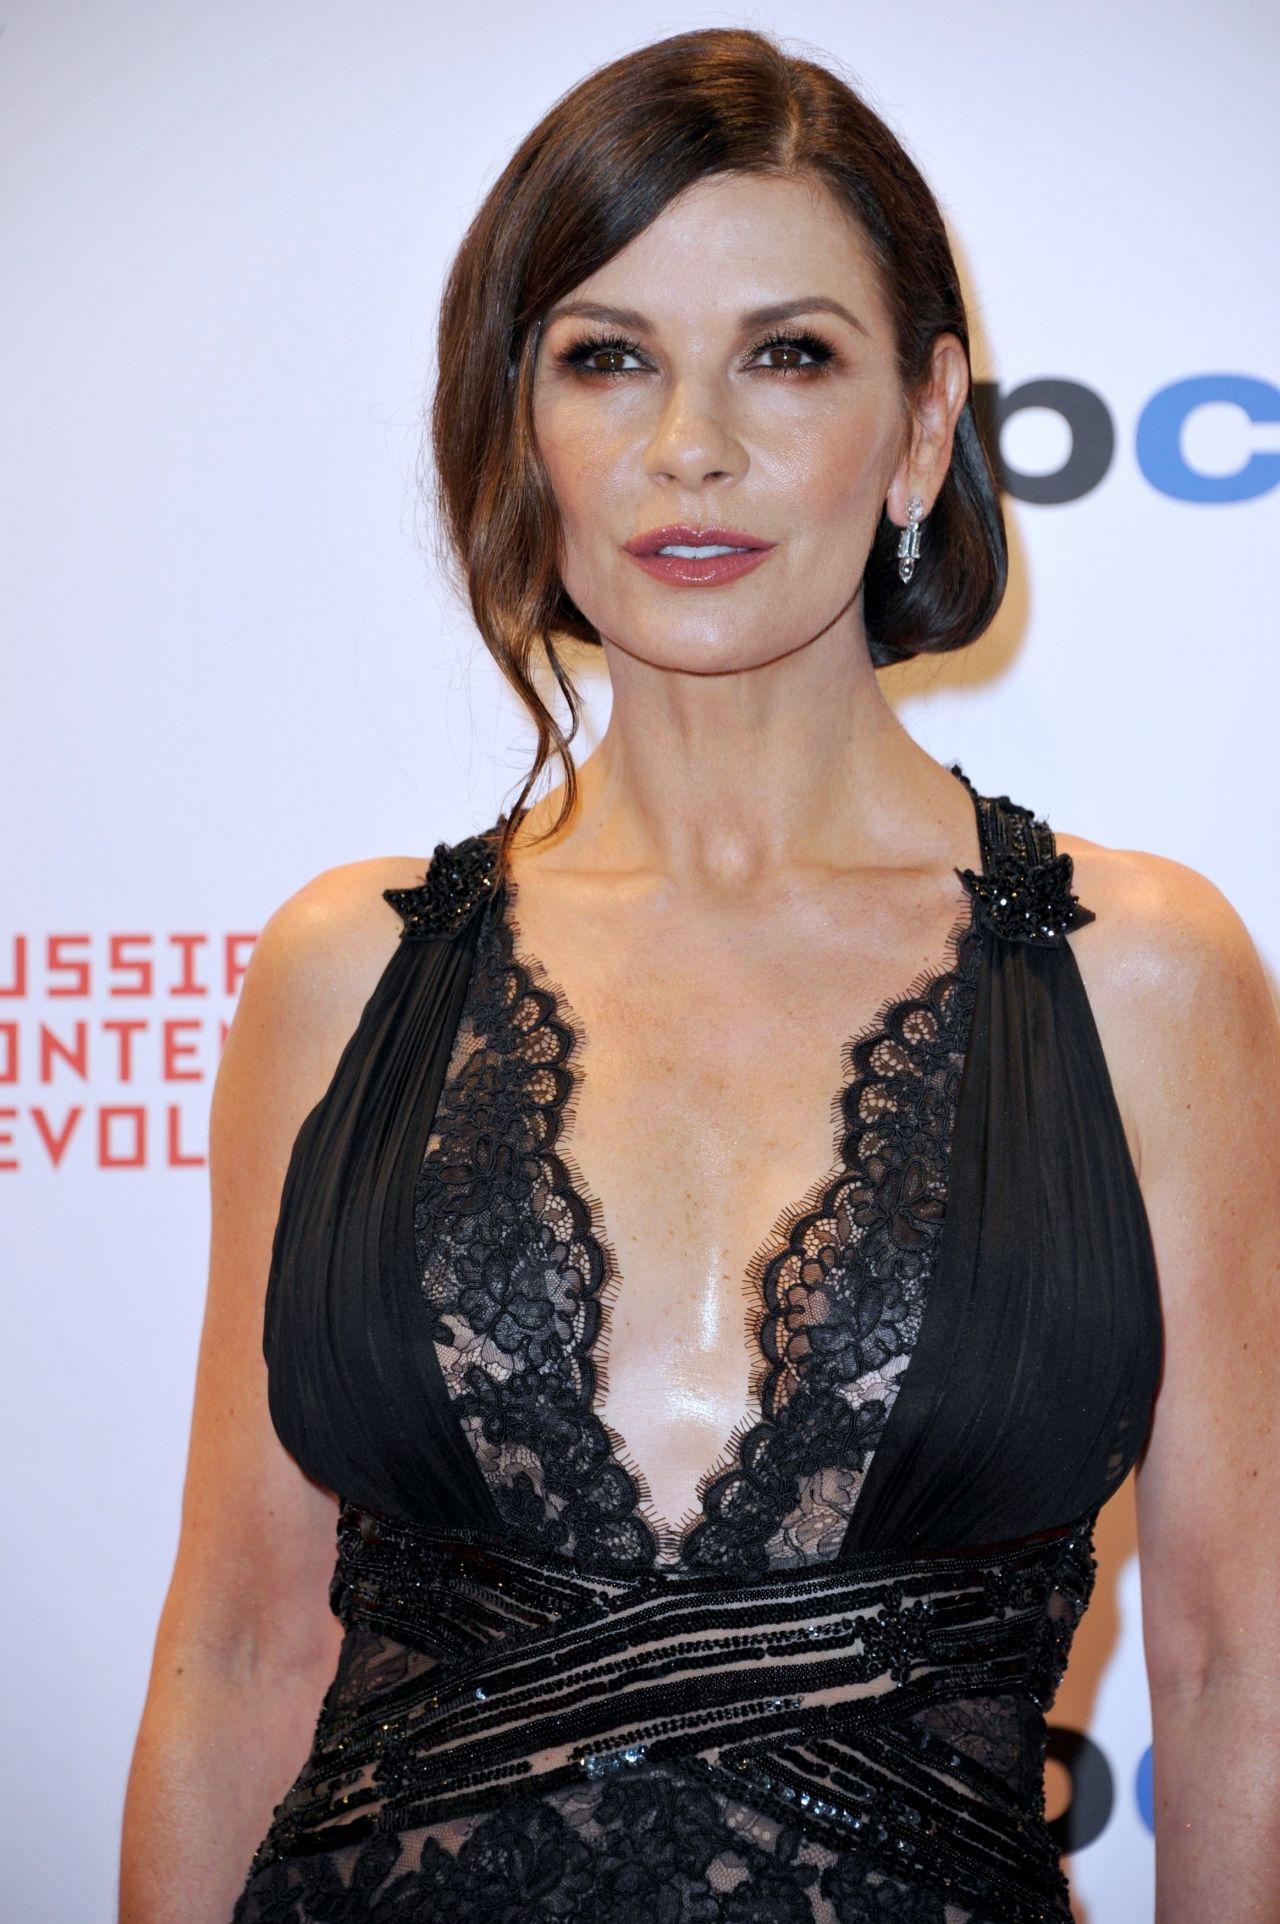 Catherine Zeta Jones Mipcom Opening Cocktail Cannes 10